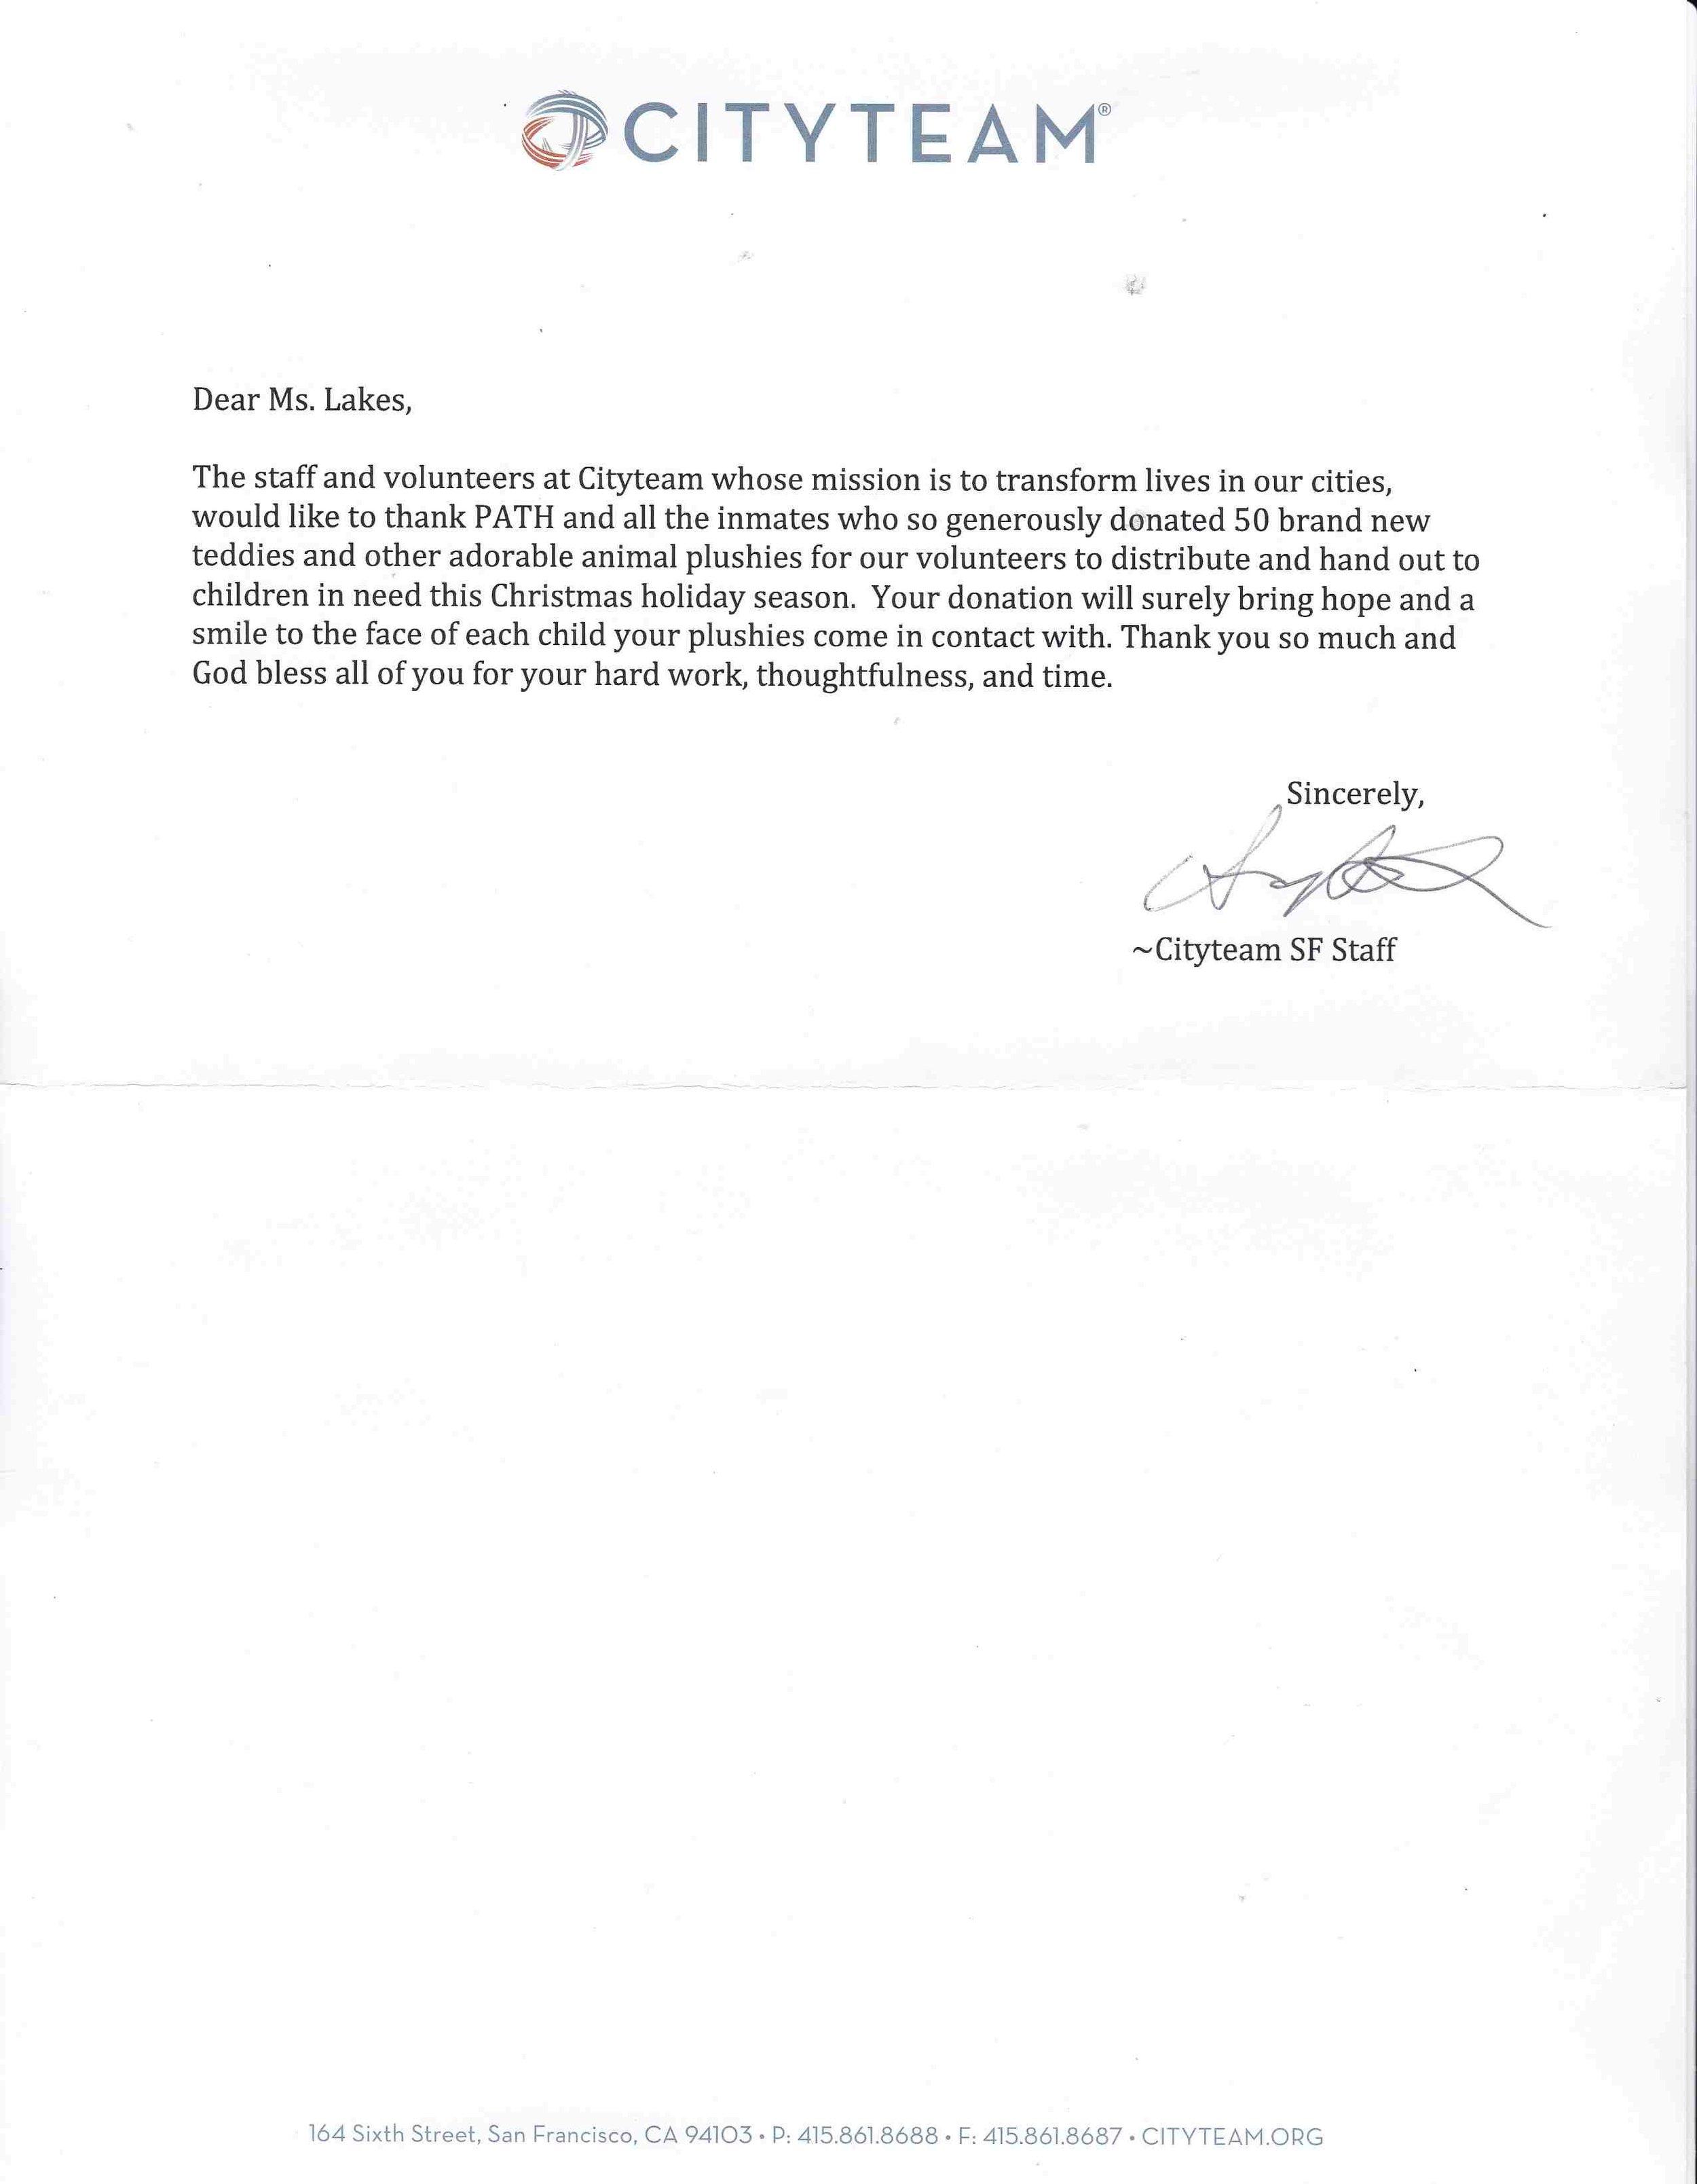 City Team appreciation letter for donation-IMG_20181219_0001.jpg